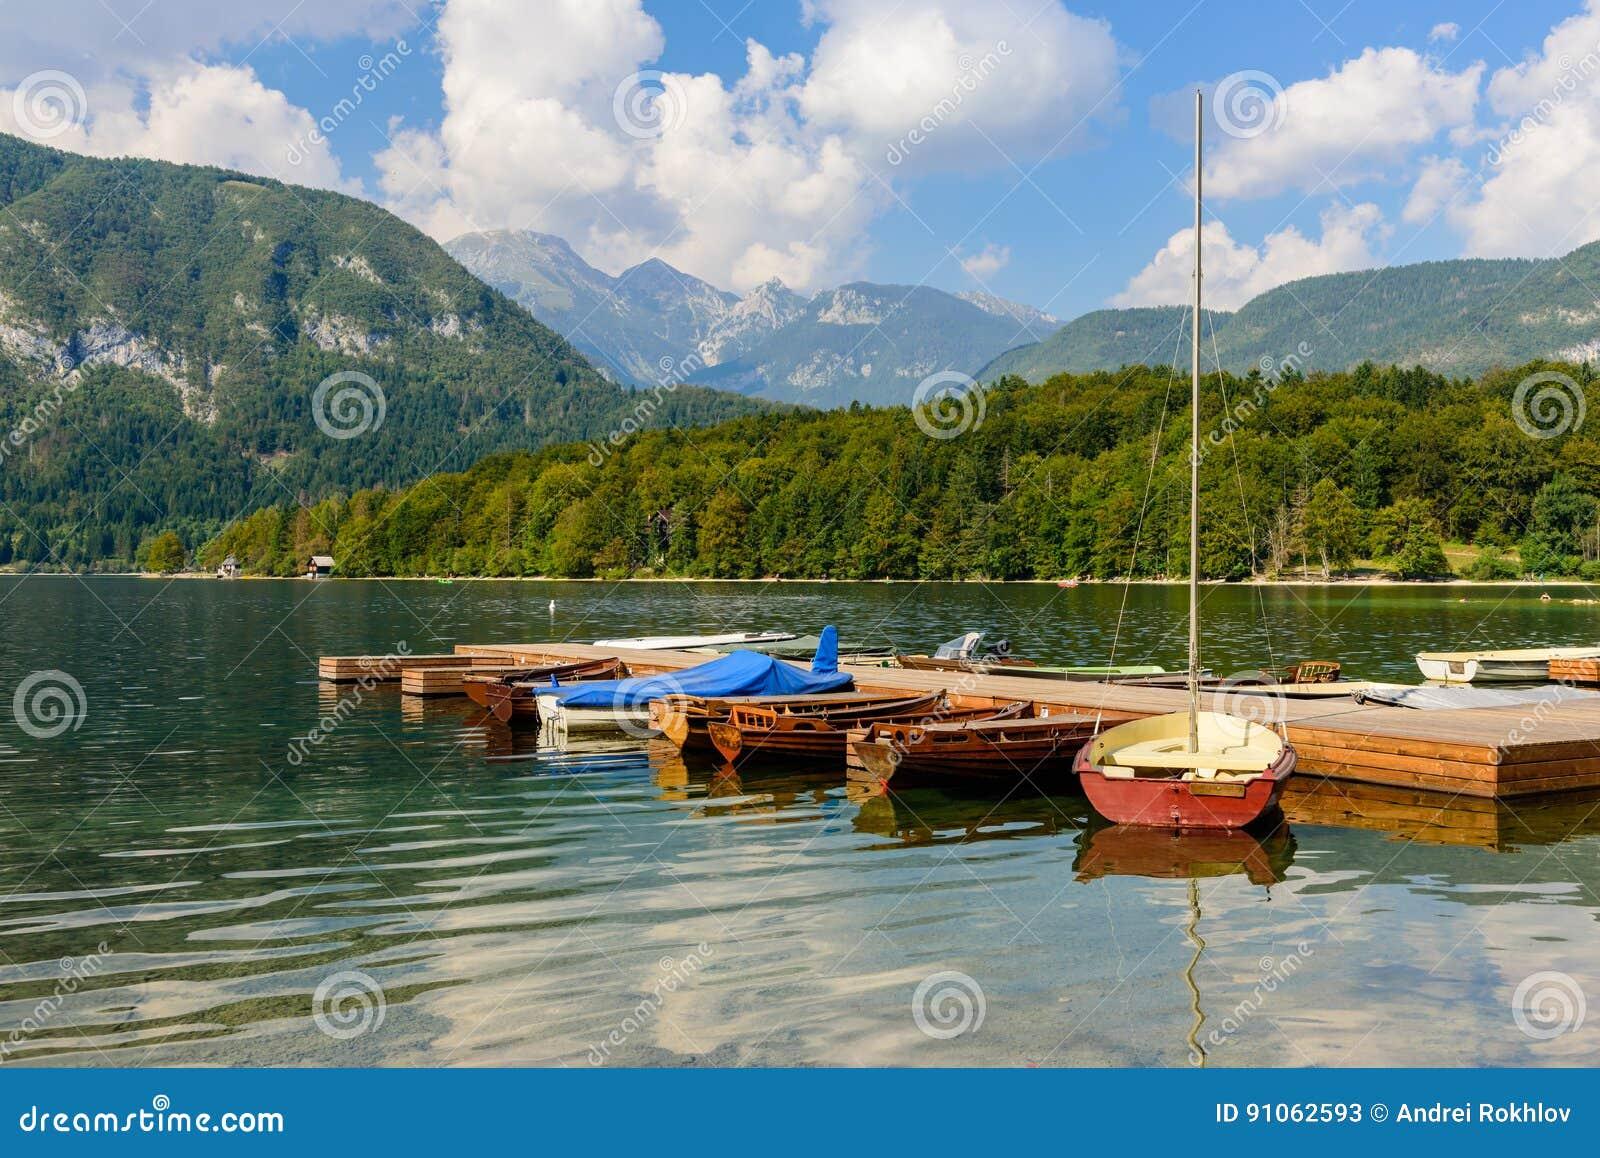 The scenic lake Bohinj